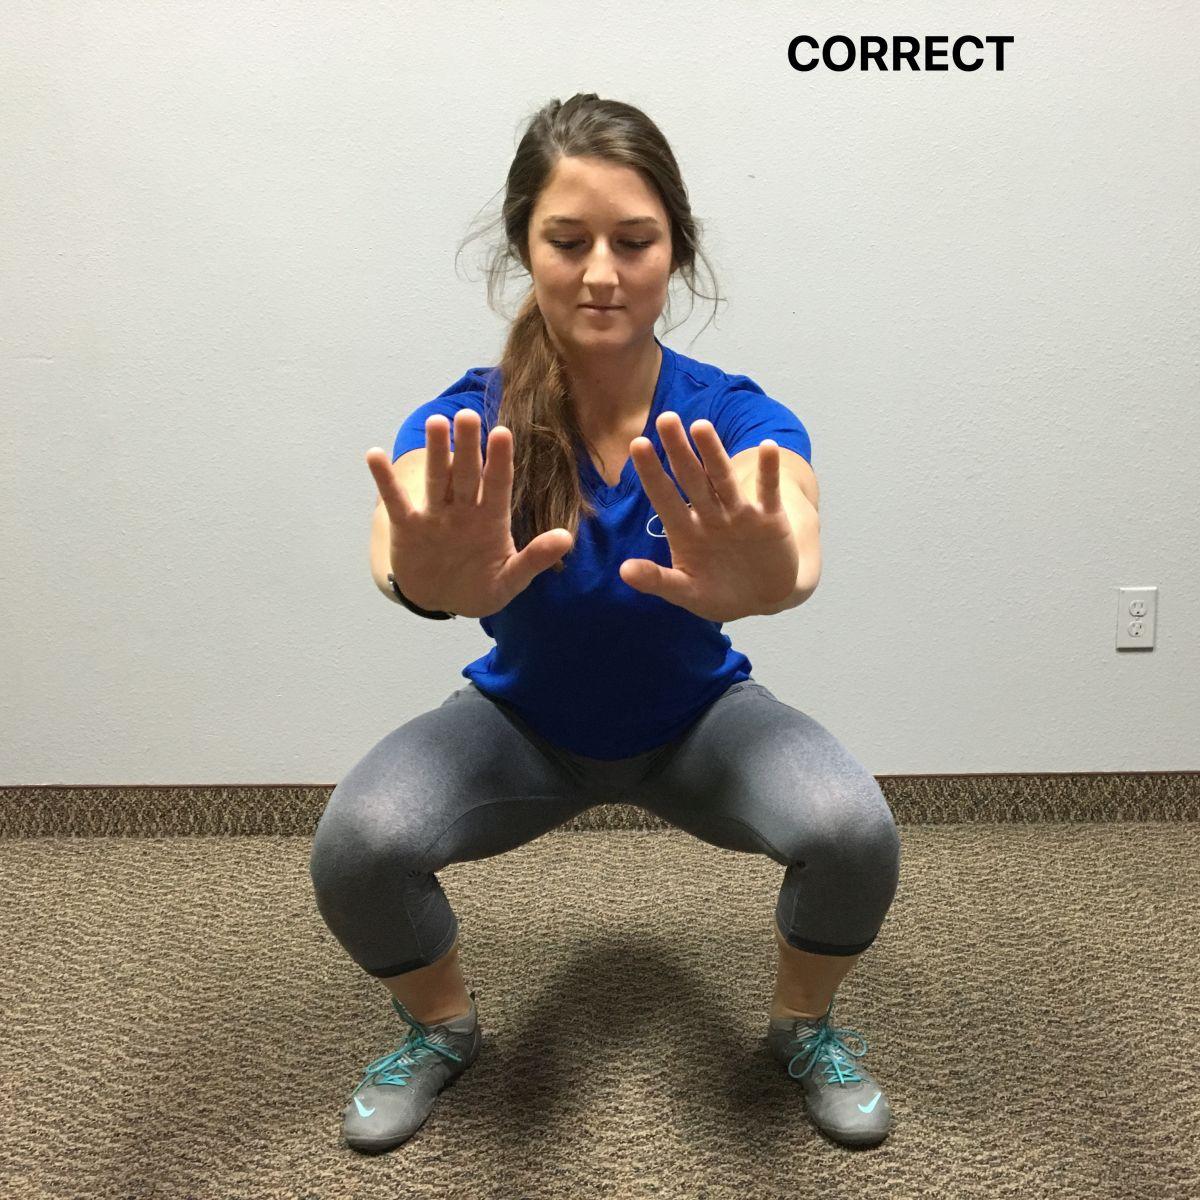 correct squat position